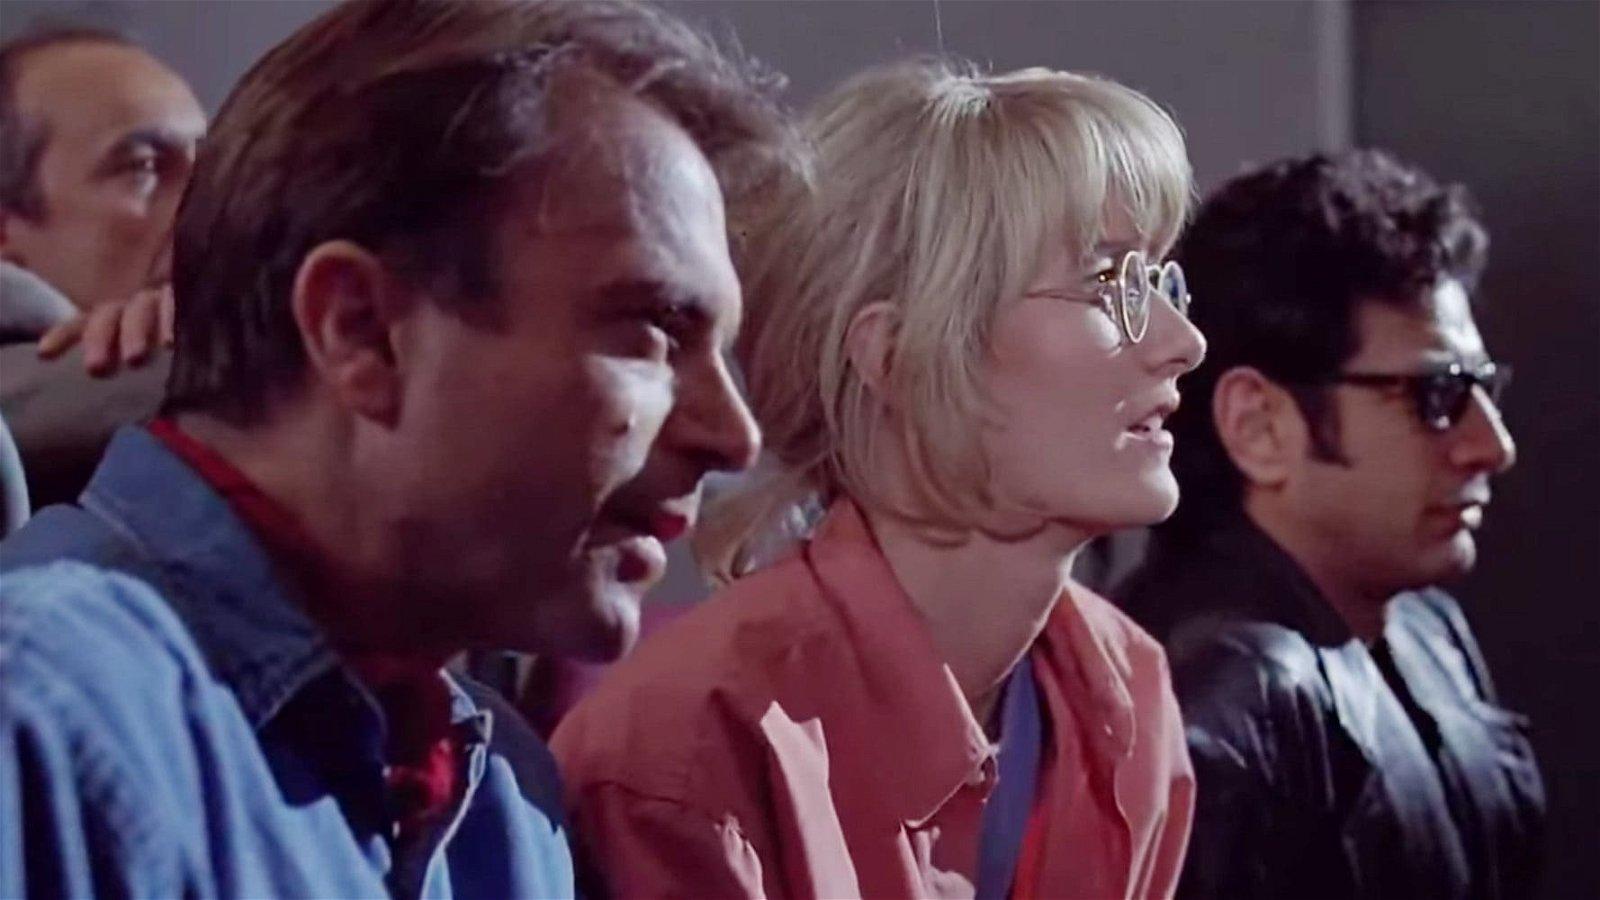 Neill, Dern, And Goldblum Confirmed To Return For Jurassic World 3 2